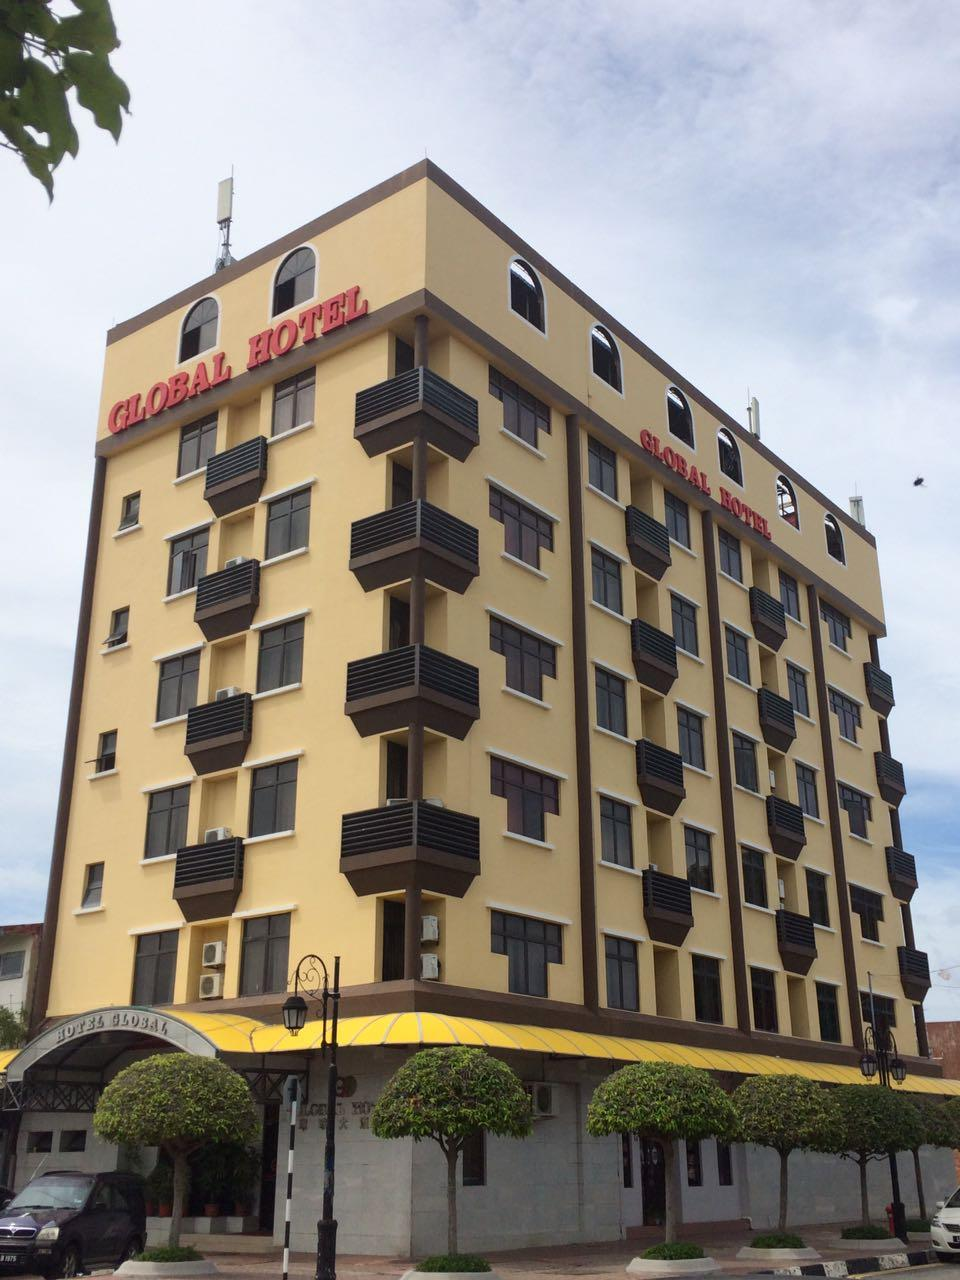 Global Hotel Labuan, Labuan